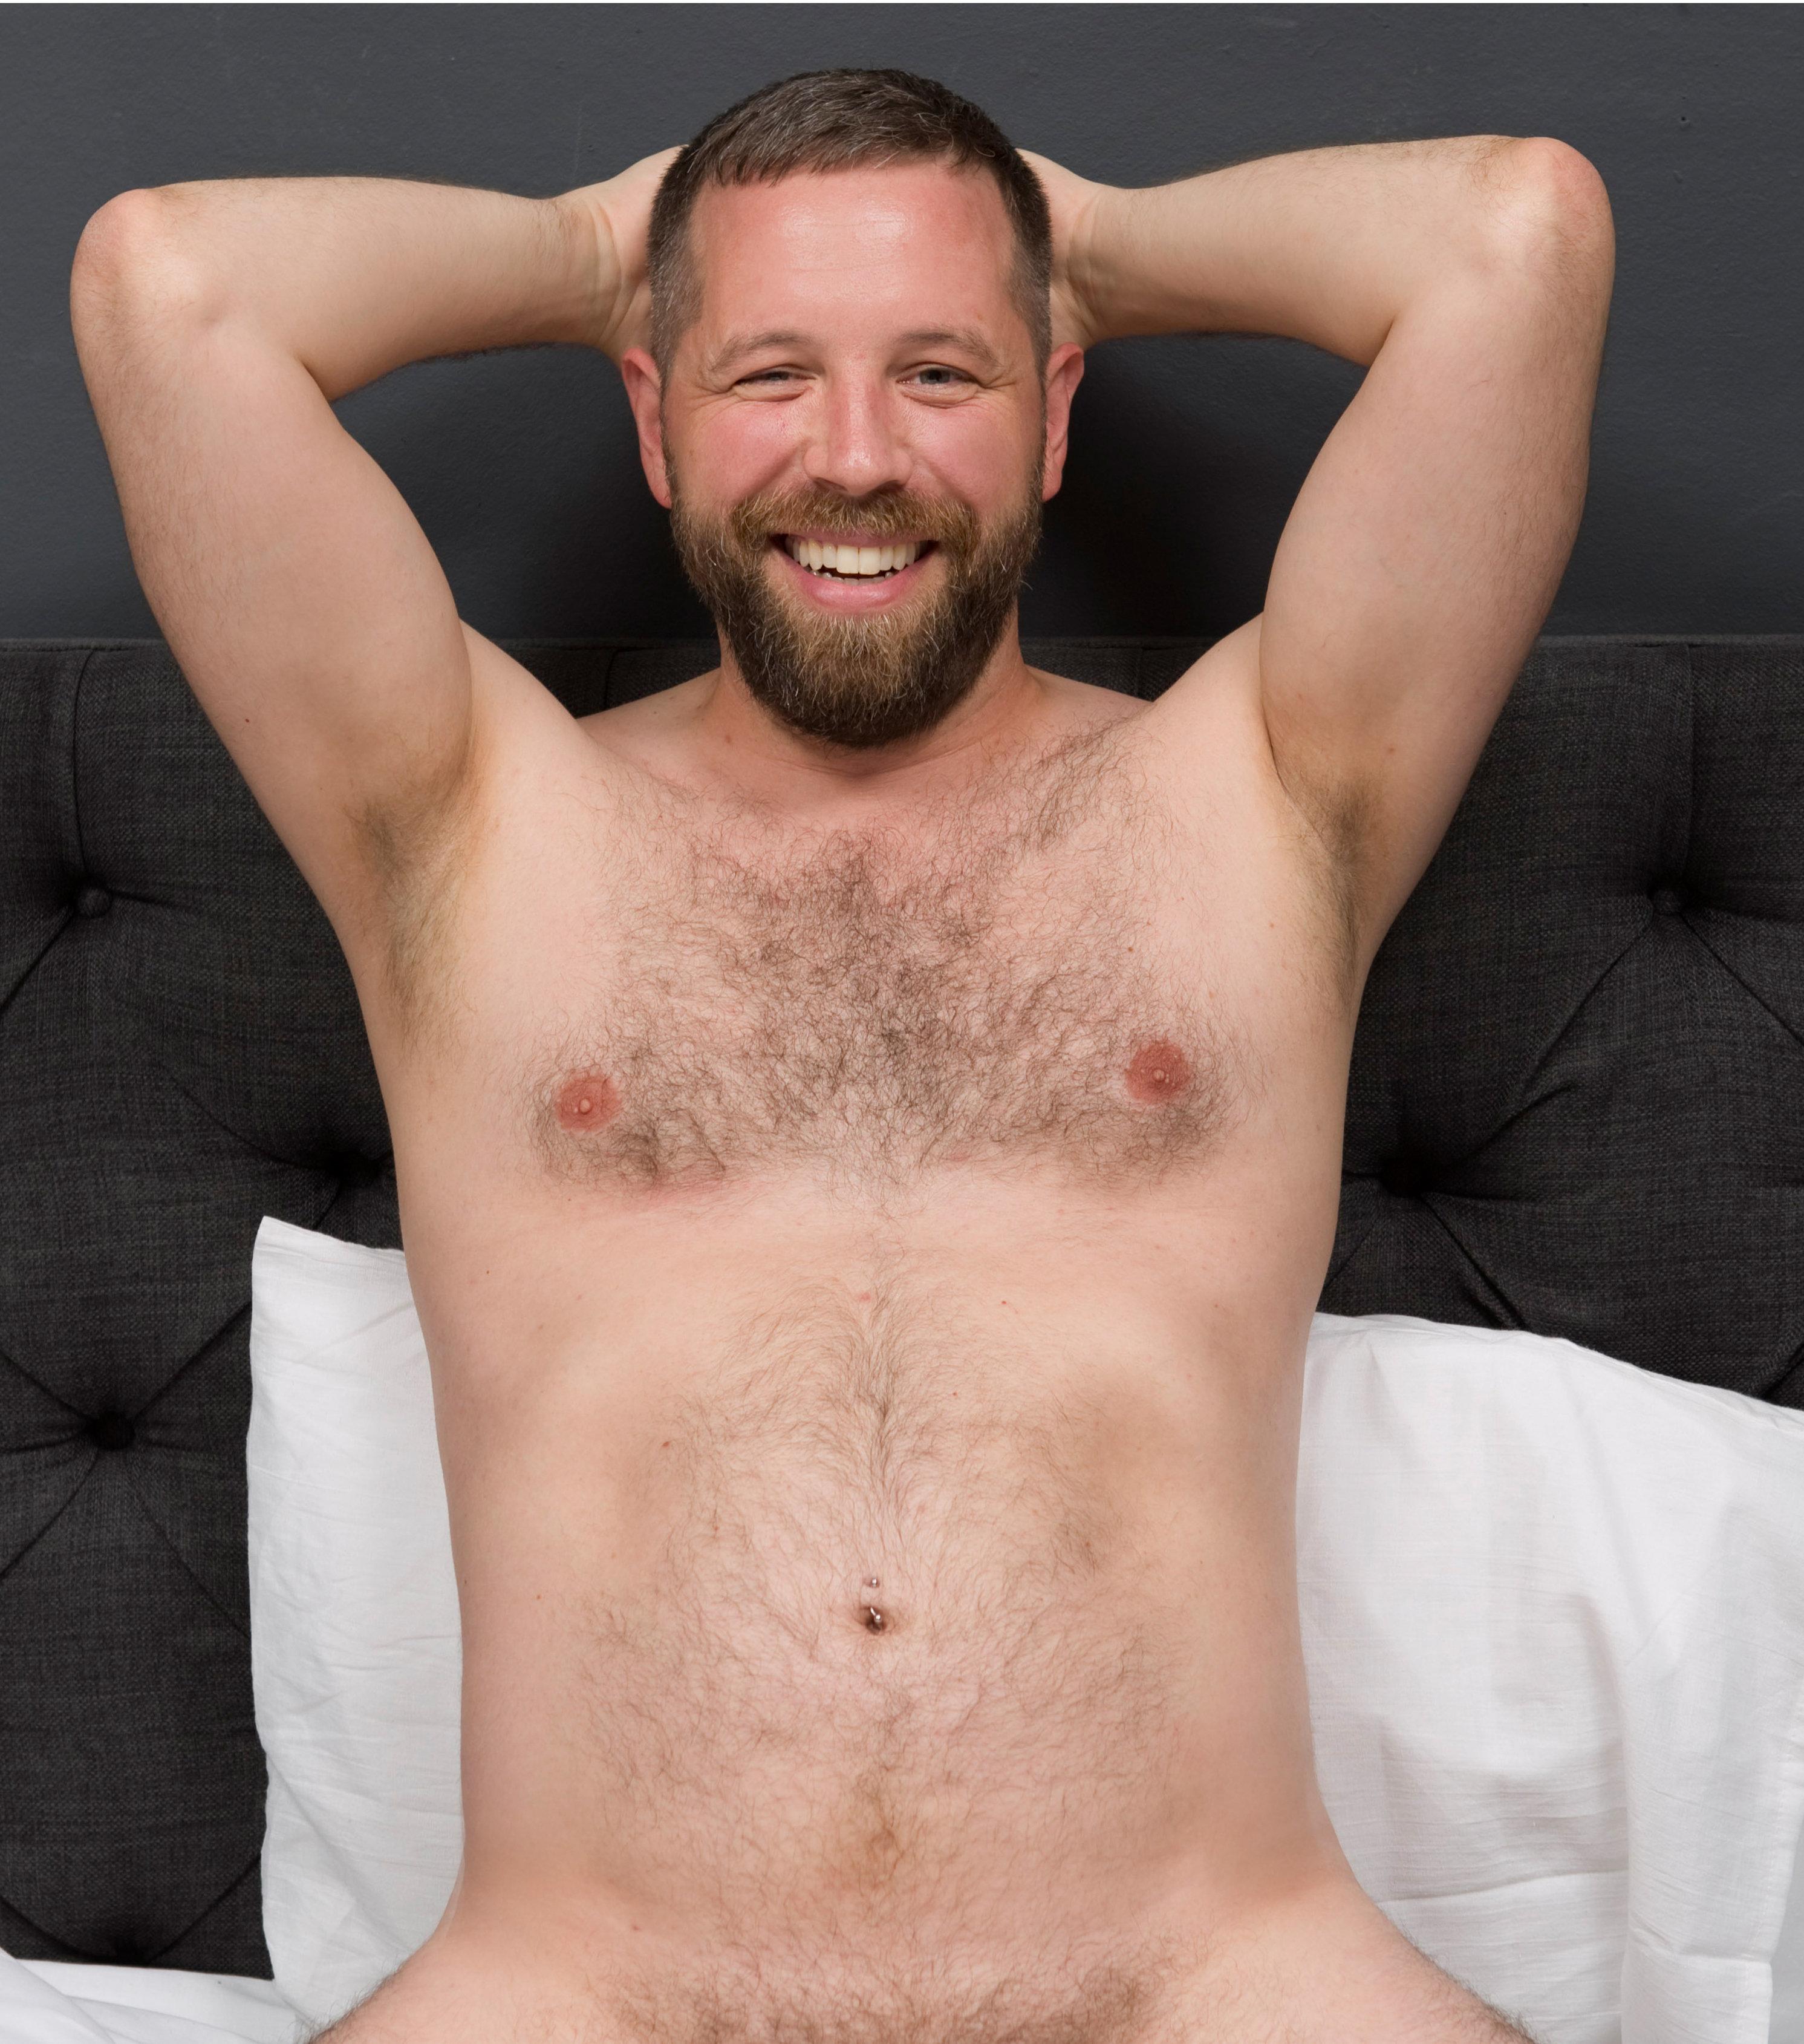 Gay photos hairy guys img